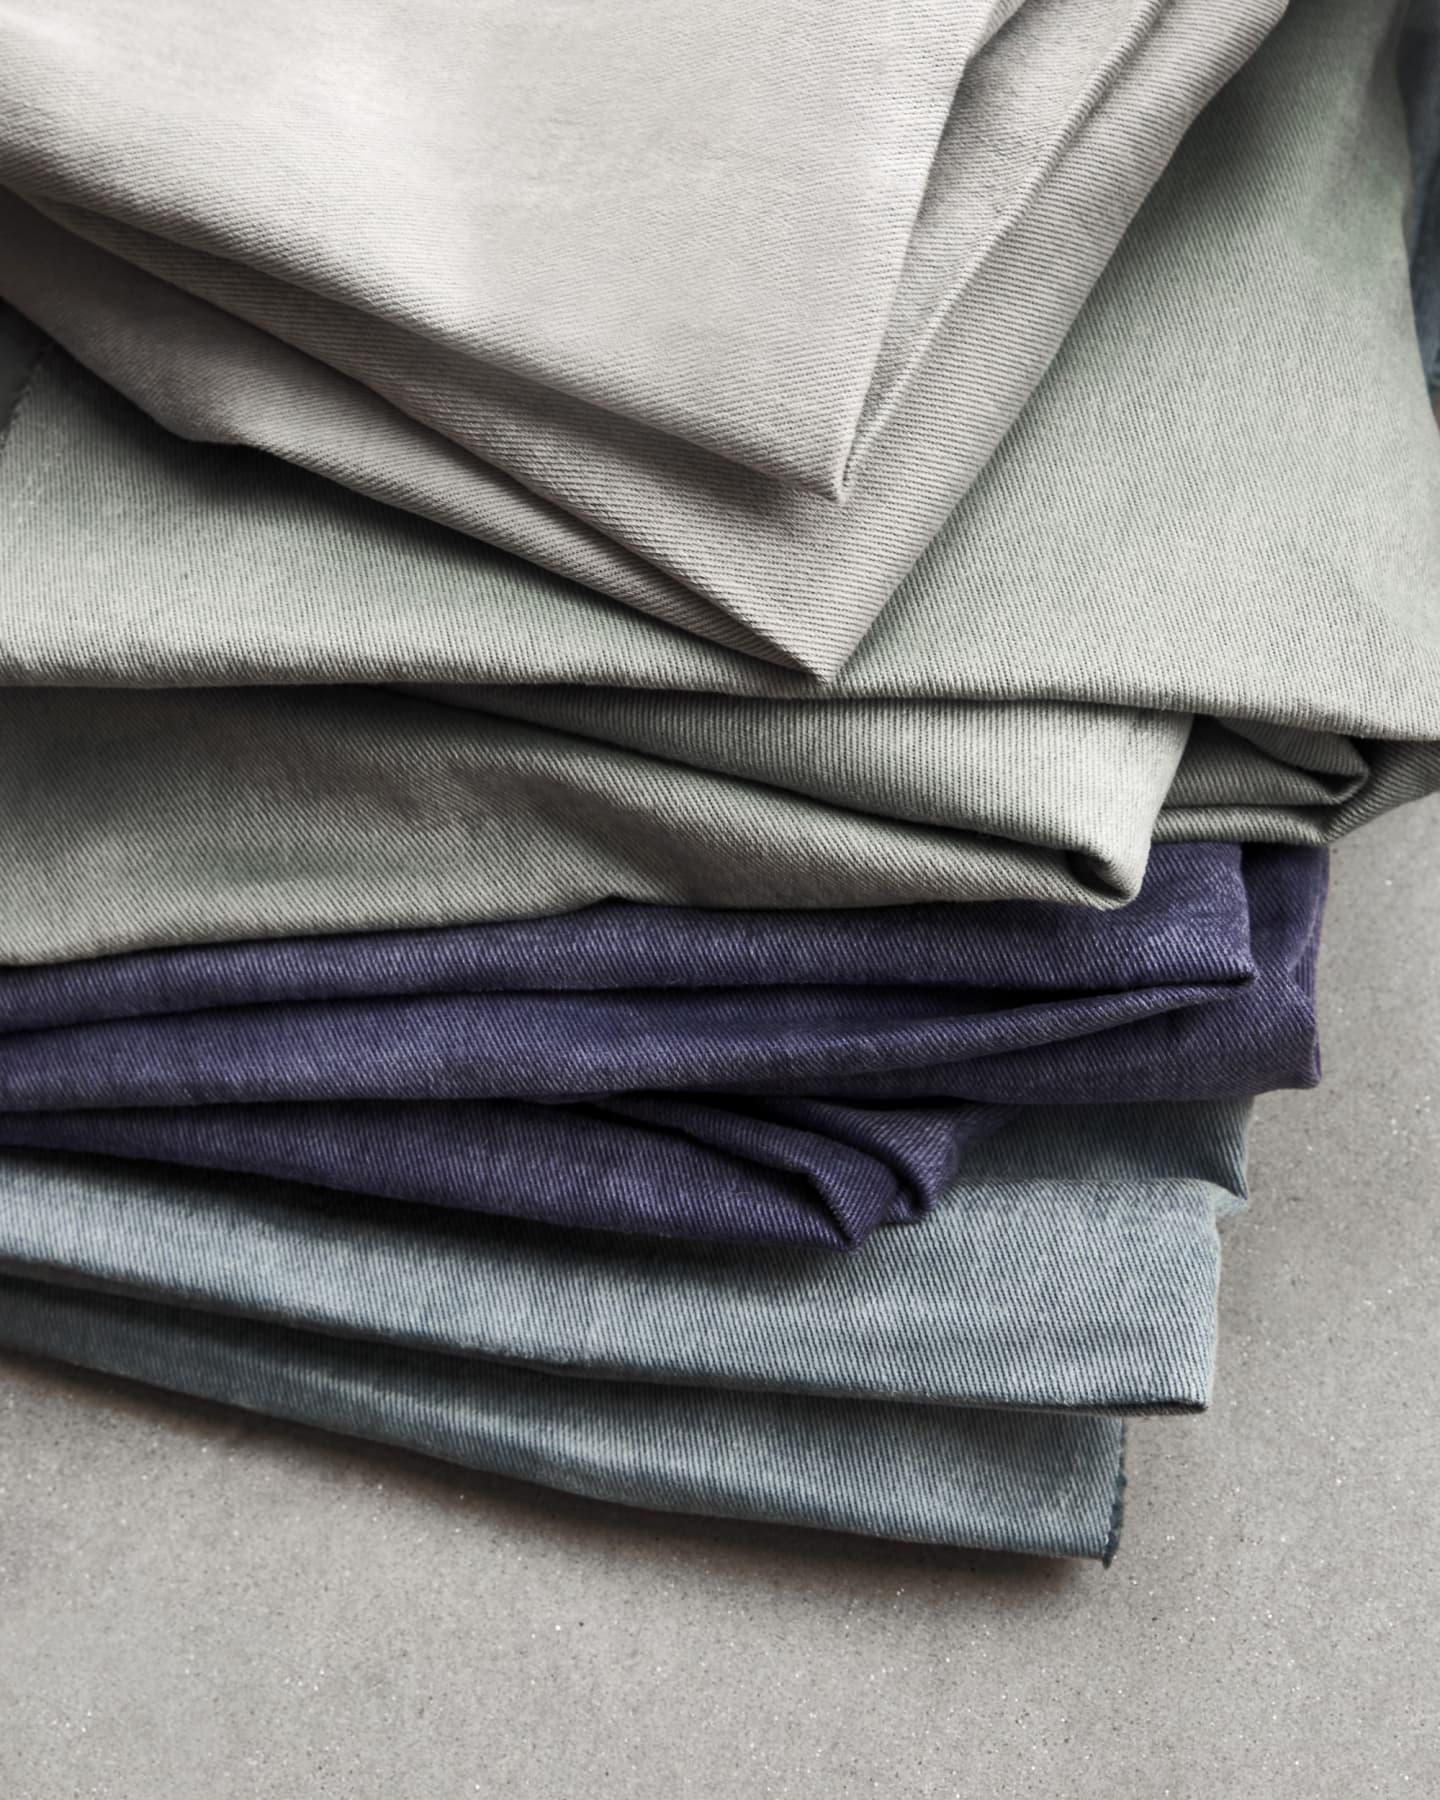 various cotton textiles